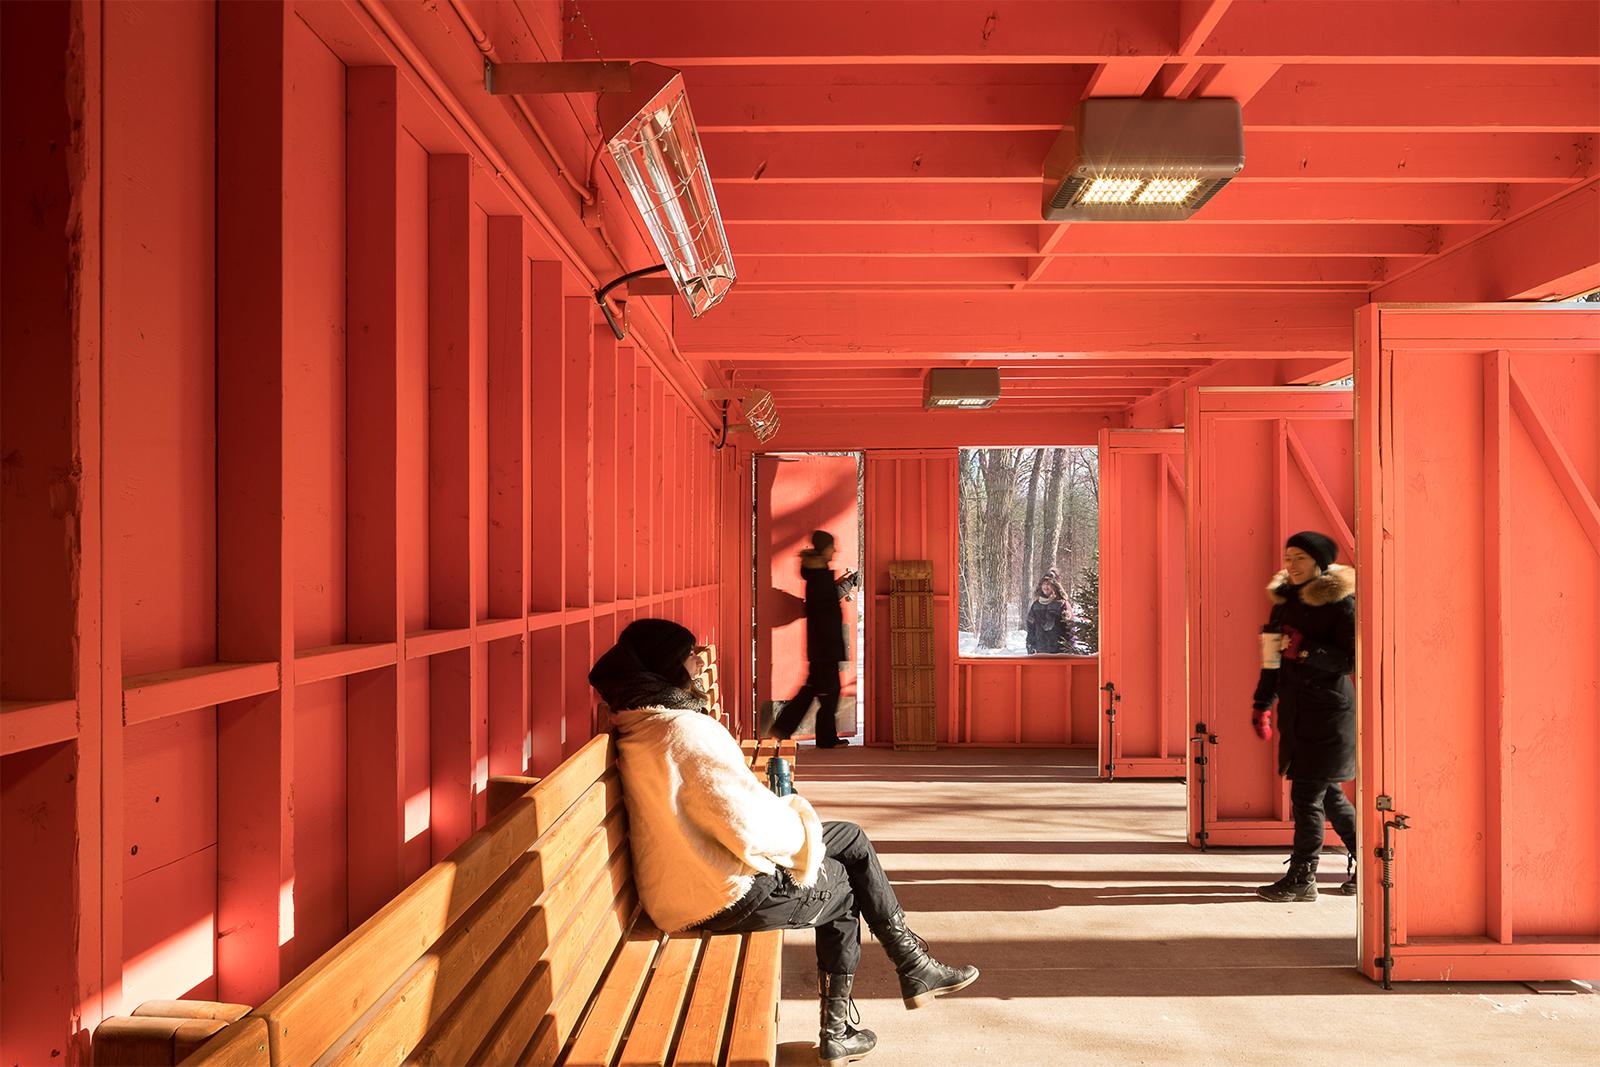 St Vital Toboggan Shelter _ Public City Architecture7.jpg